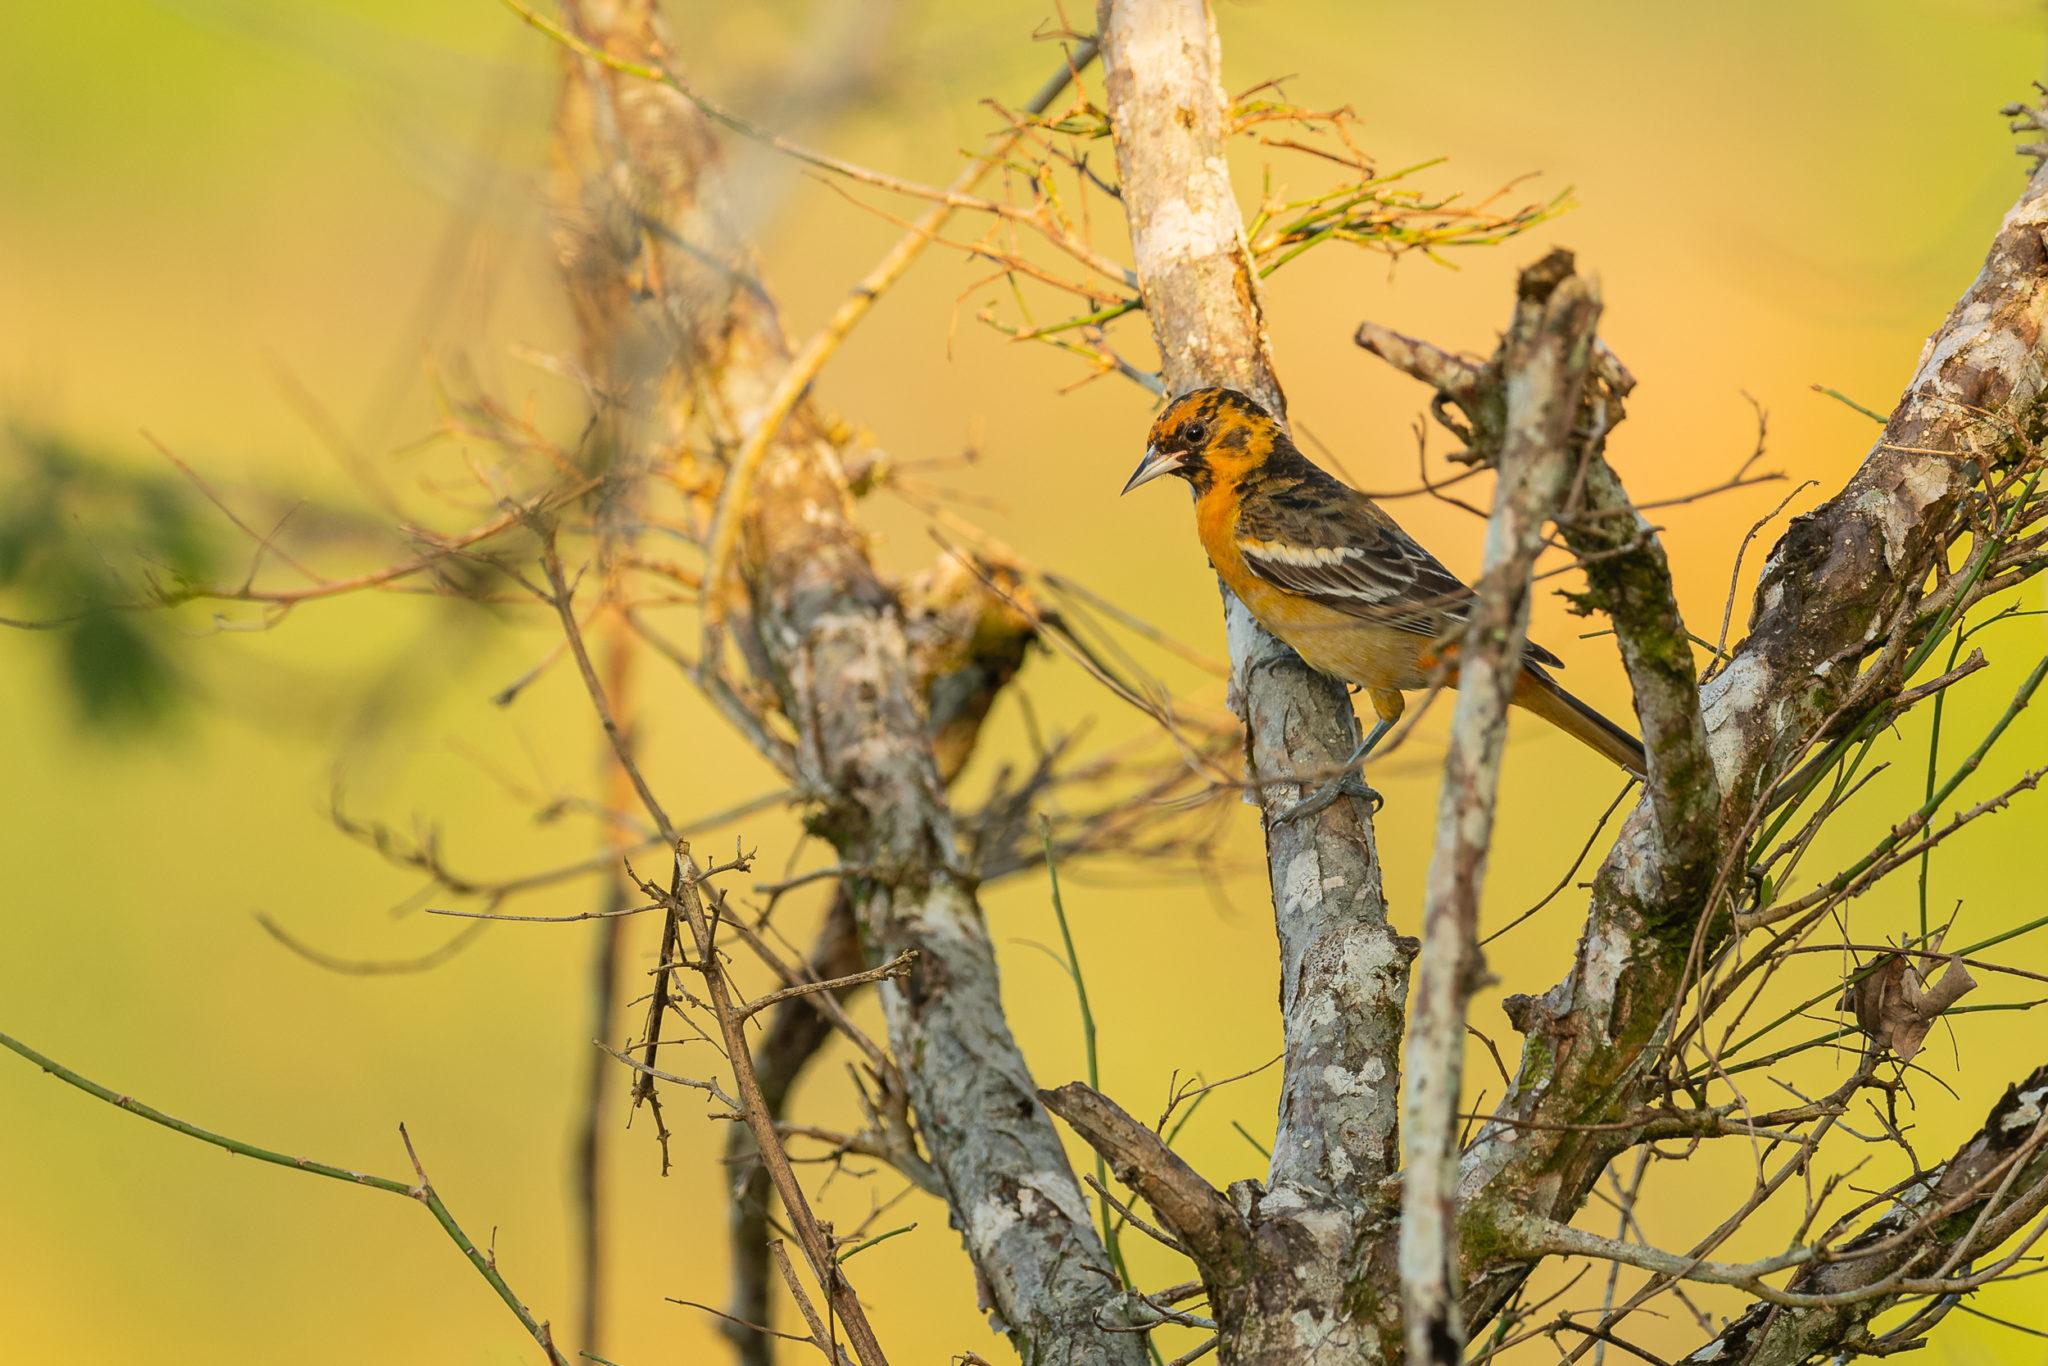 Juvenile männliche Baltimore-Oriole (Icterus galbula) oder Baltimoretrupial, Naturfotografie Olaf & Sylvia Rentzsch